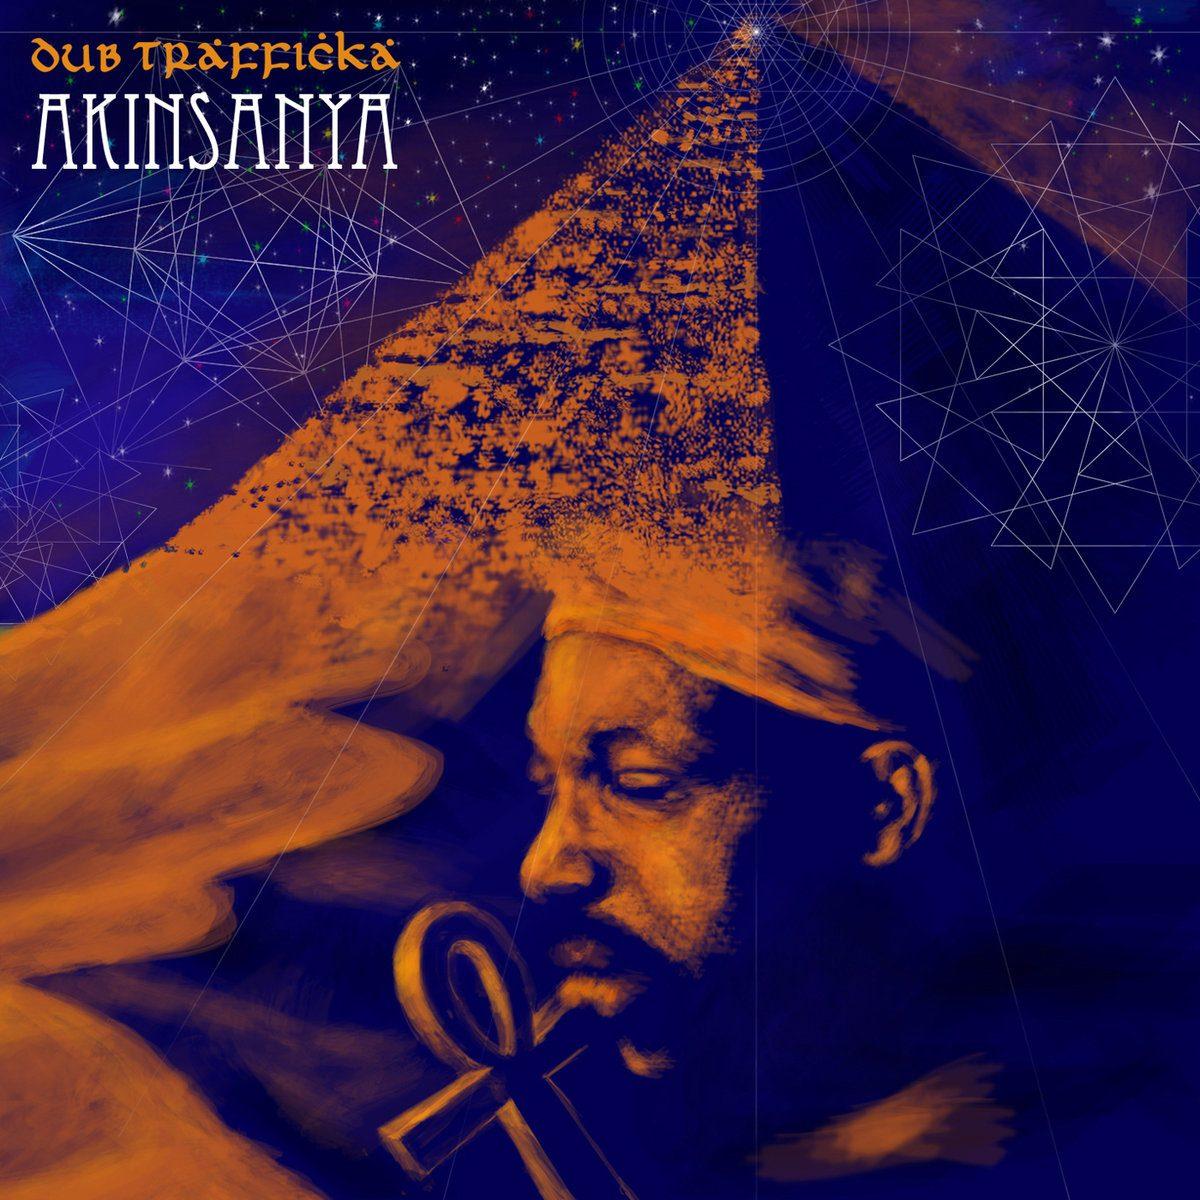 Akinsanya - Dub Trafficka